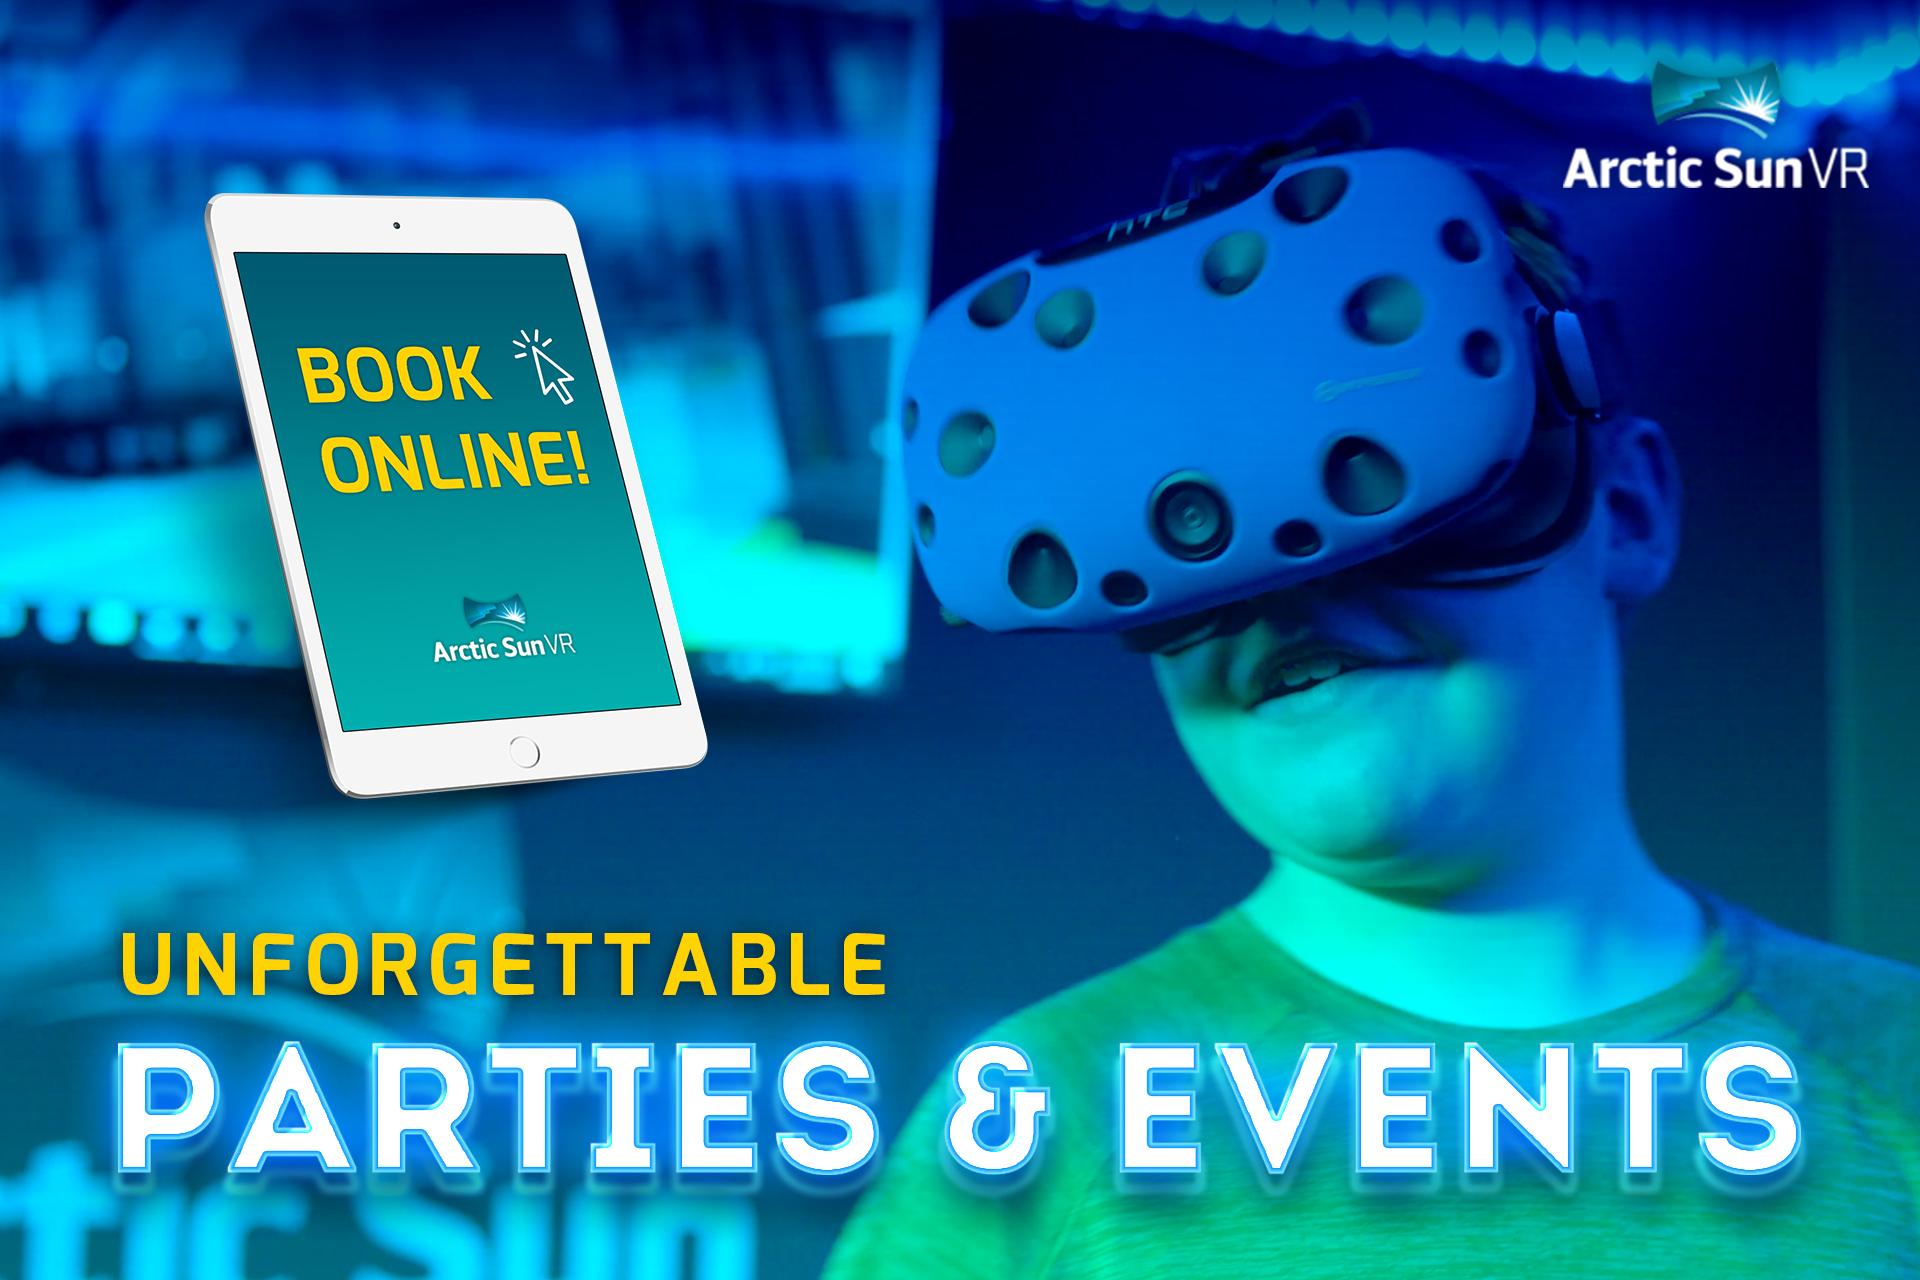 Arctic-Sun-VR-PartiesEvents-1.jpg